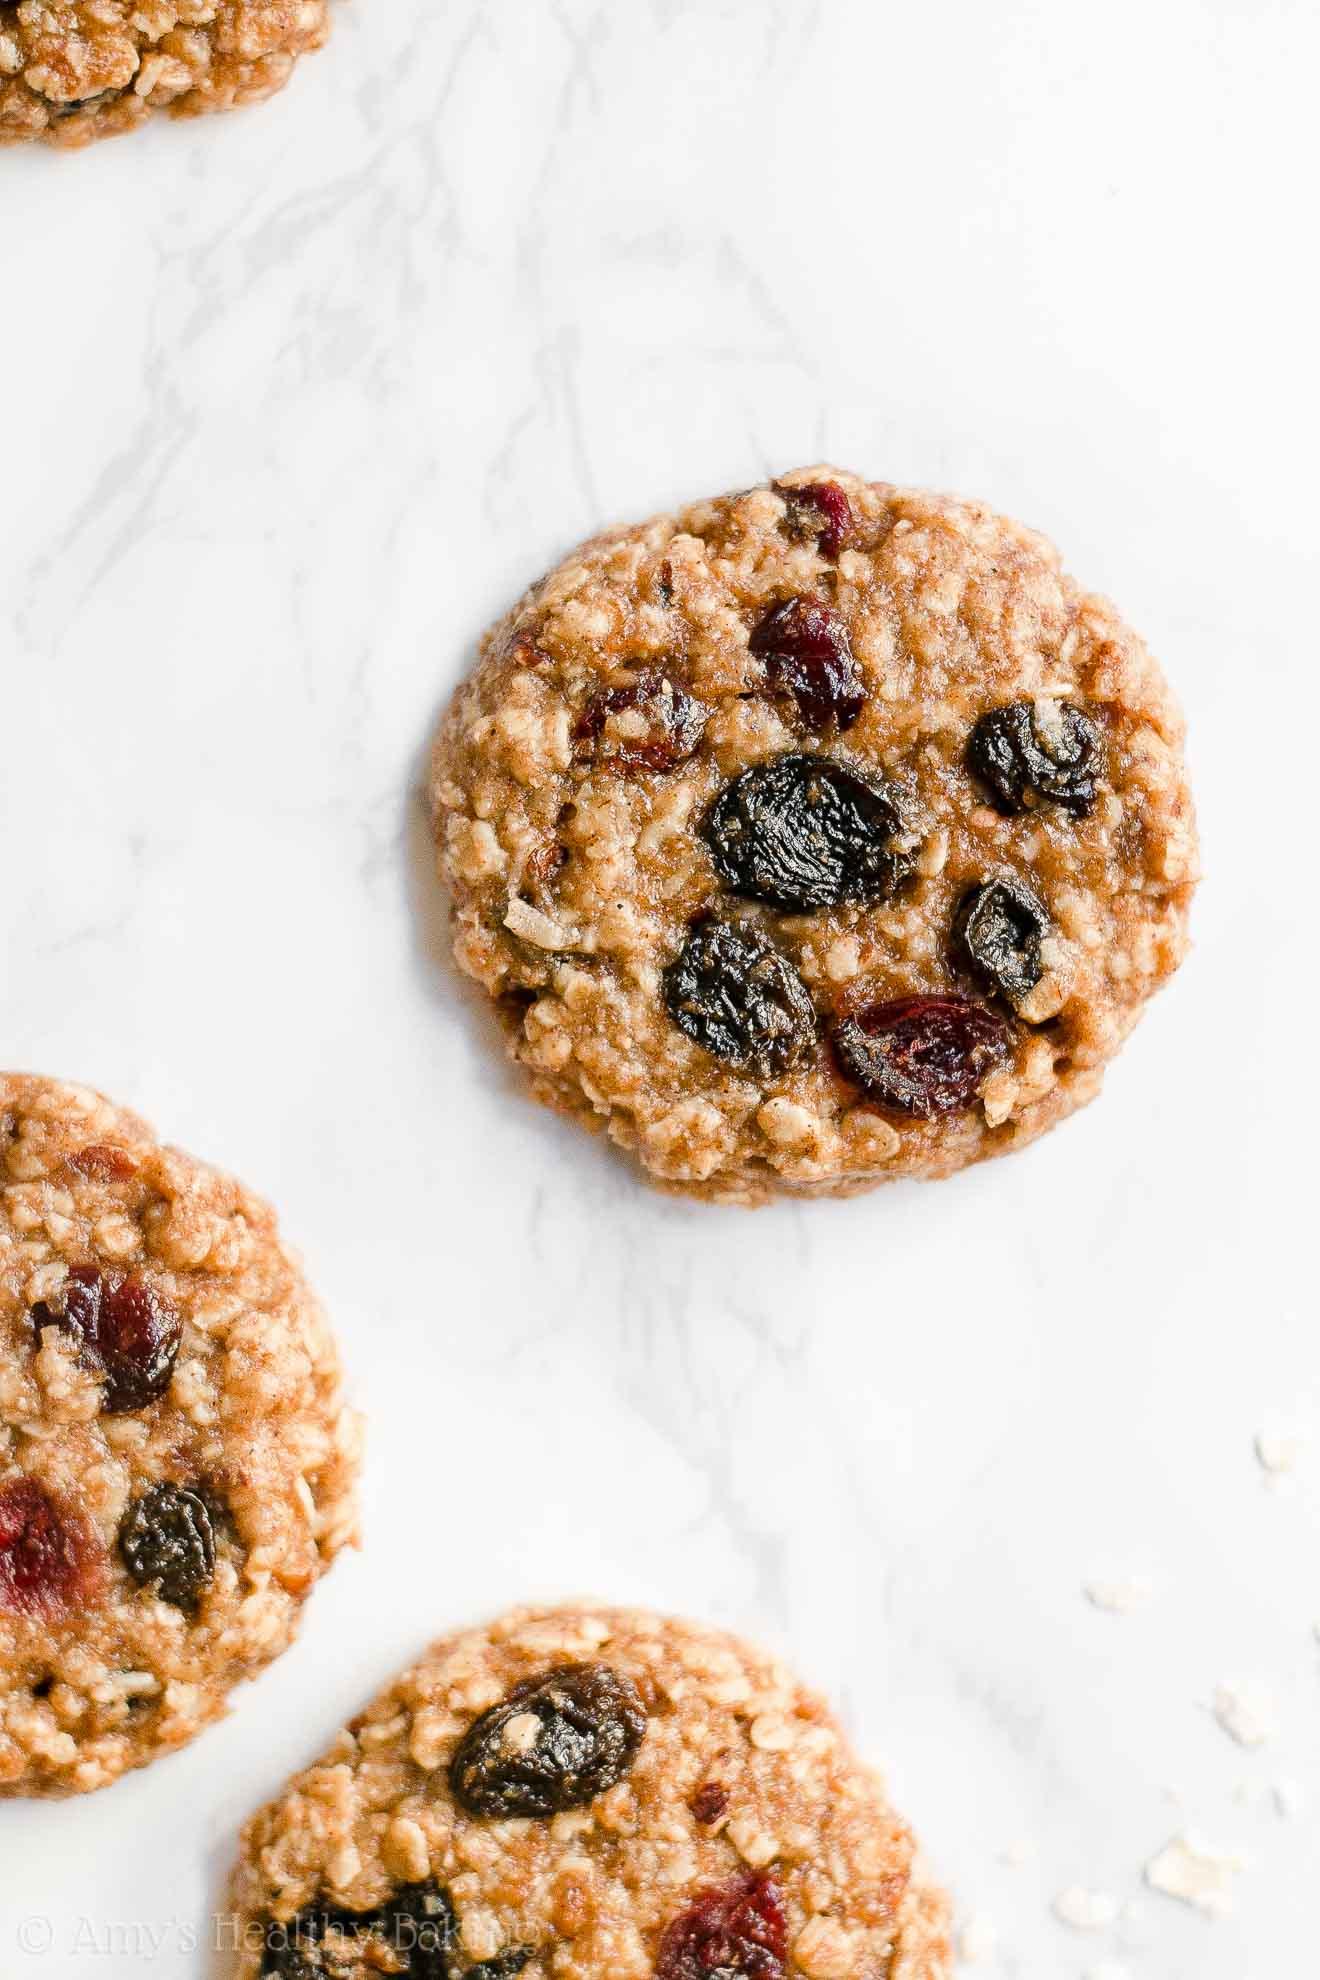 Healthy Clean Eating Chewy Harvest Cookies - oatmeal, craisin, raisin, pecan, coconut cookies